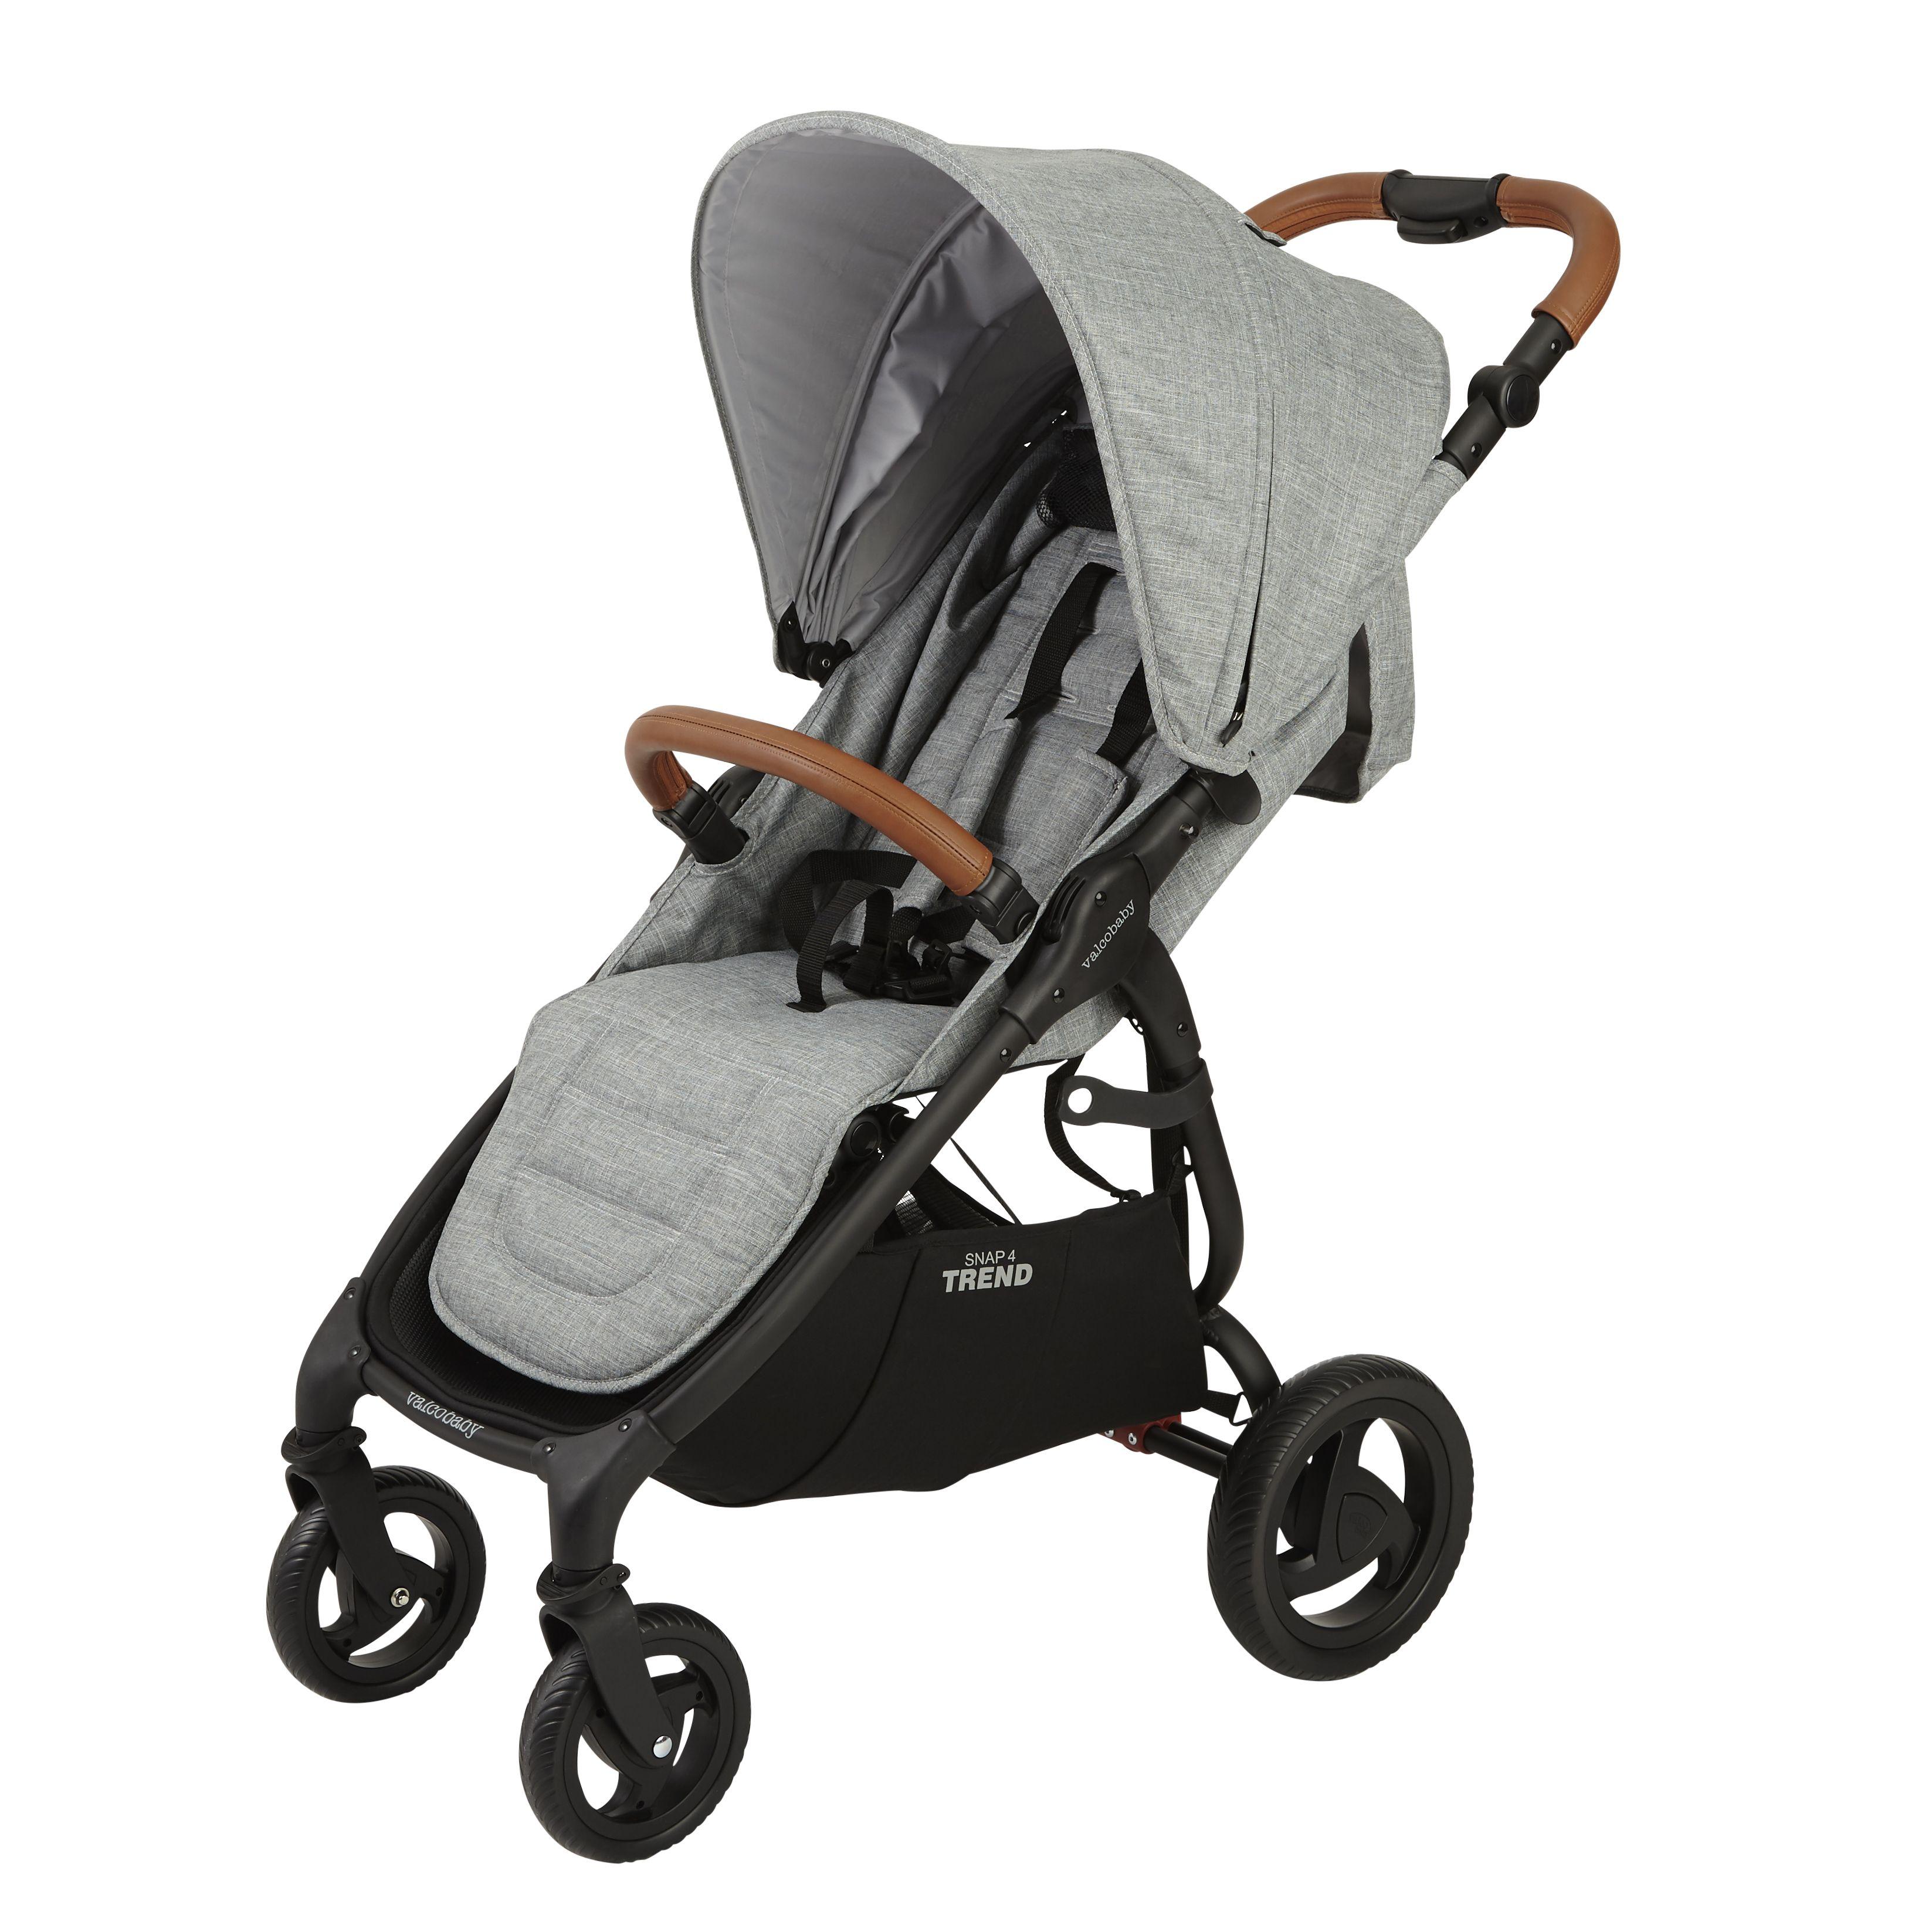 Snap4 Trend in Grey Marle Stroller, Baby stroller